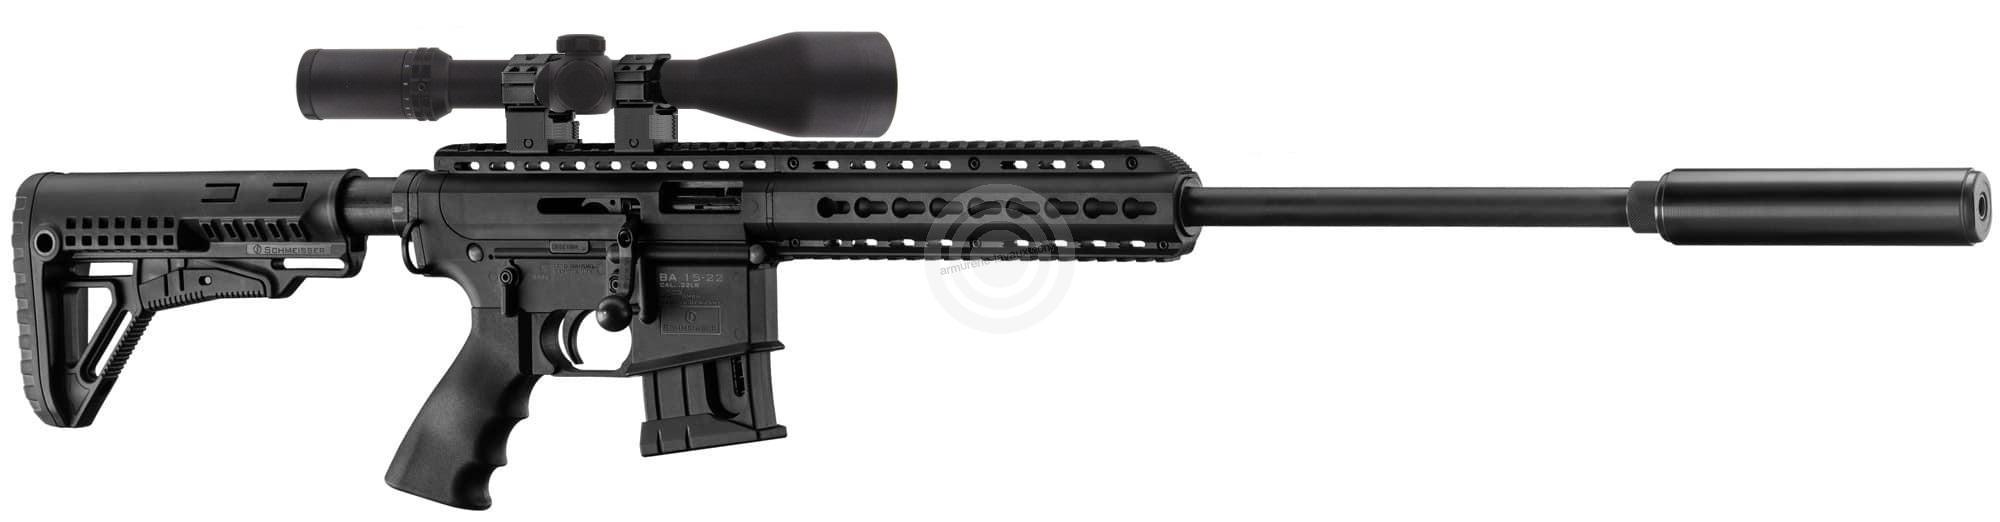 Carabine SCHMEISSER BA-15 cal.22lr